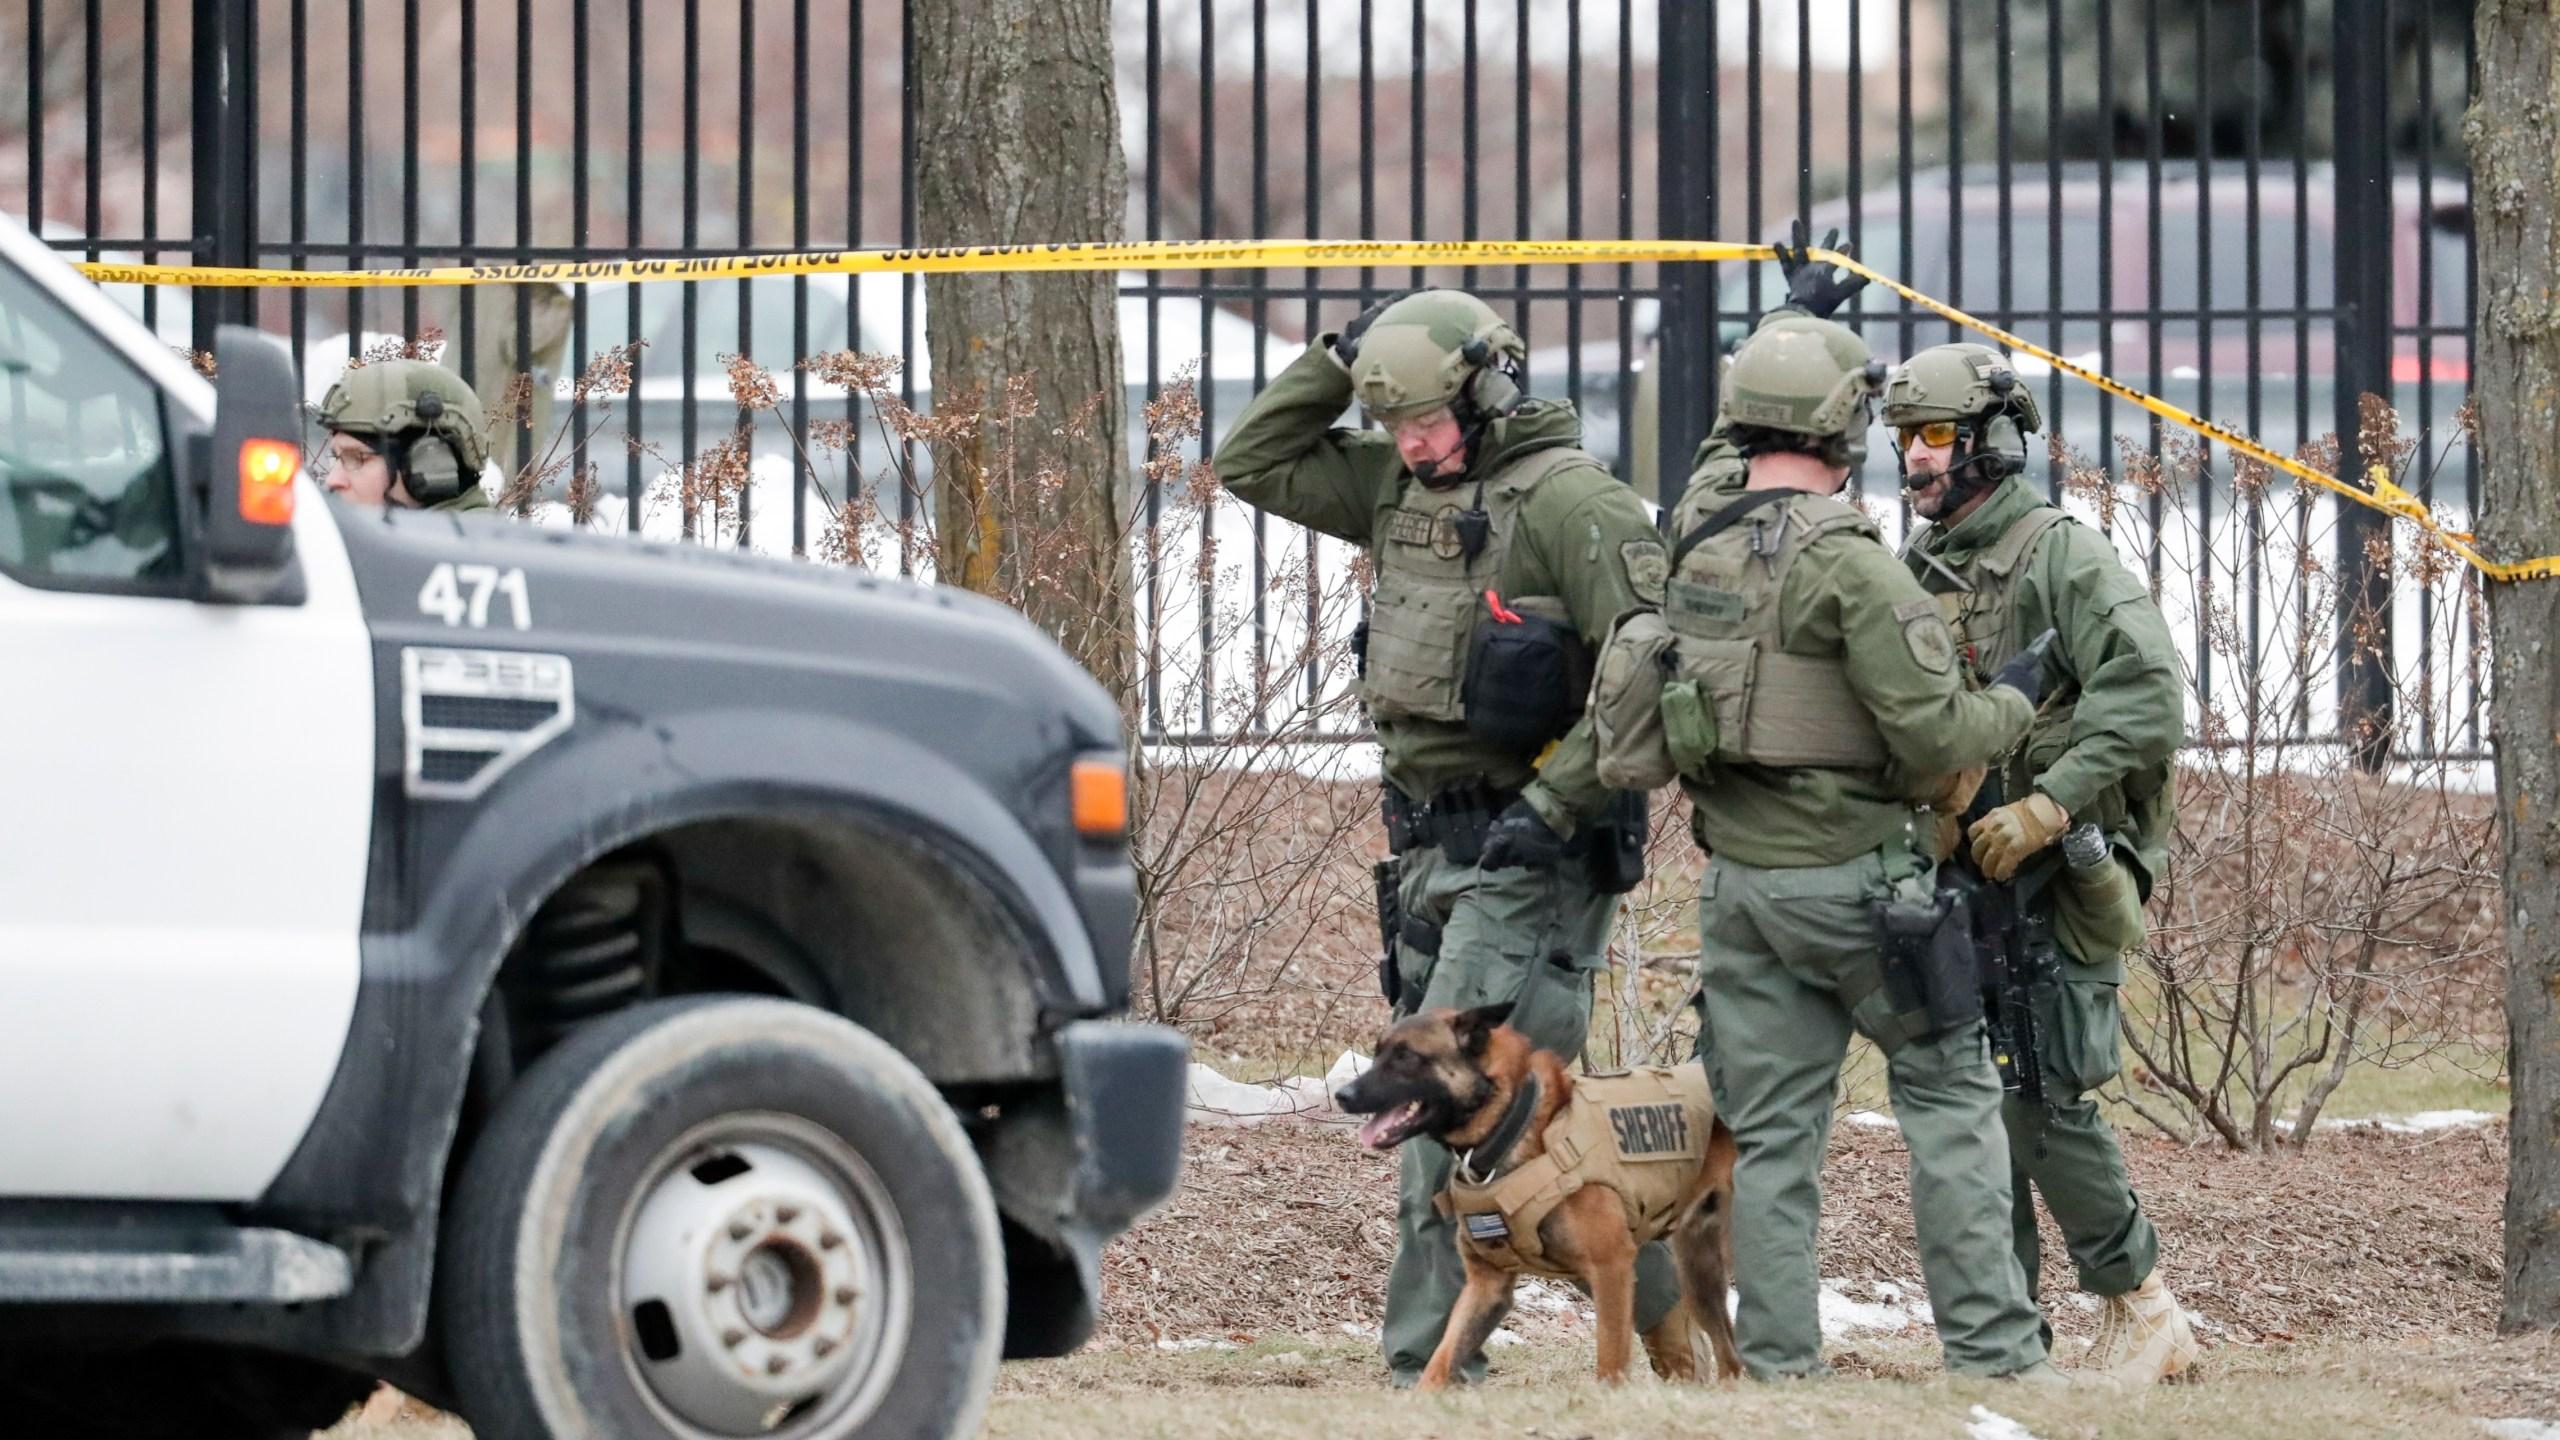 Milwaukee Brewing Co Halloween 2020 Gunman kills 5 at Milwaukee brewery before taking own life – WAVY.com